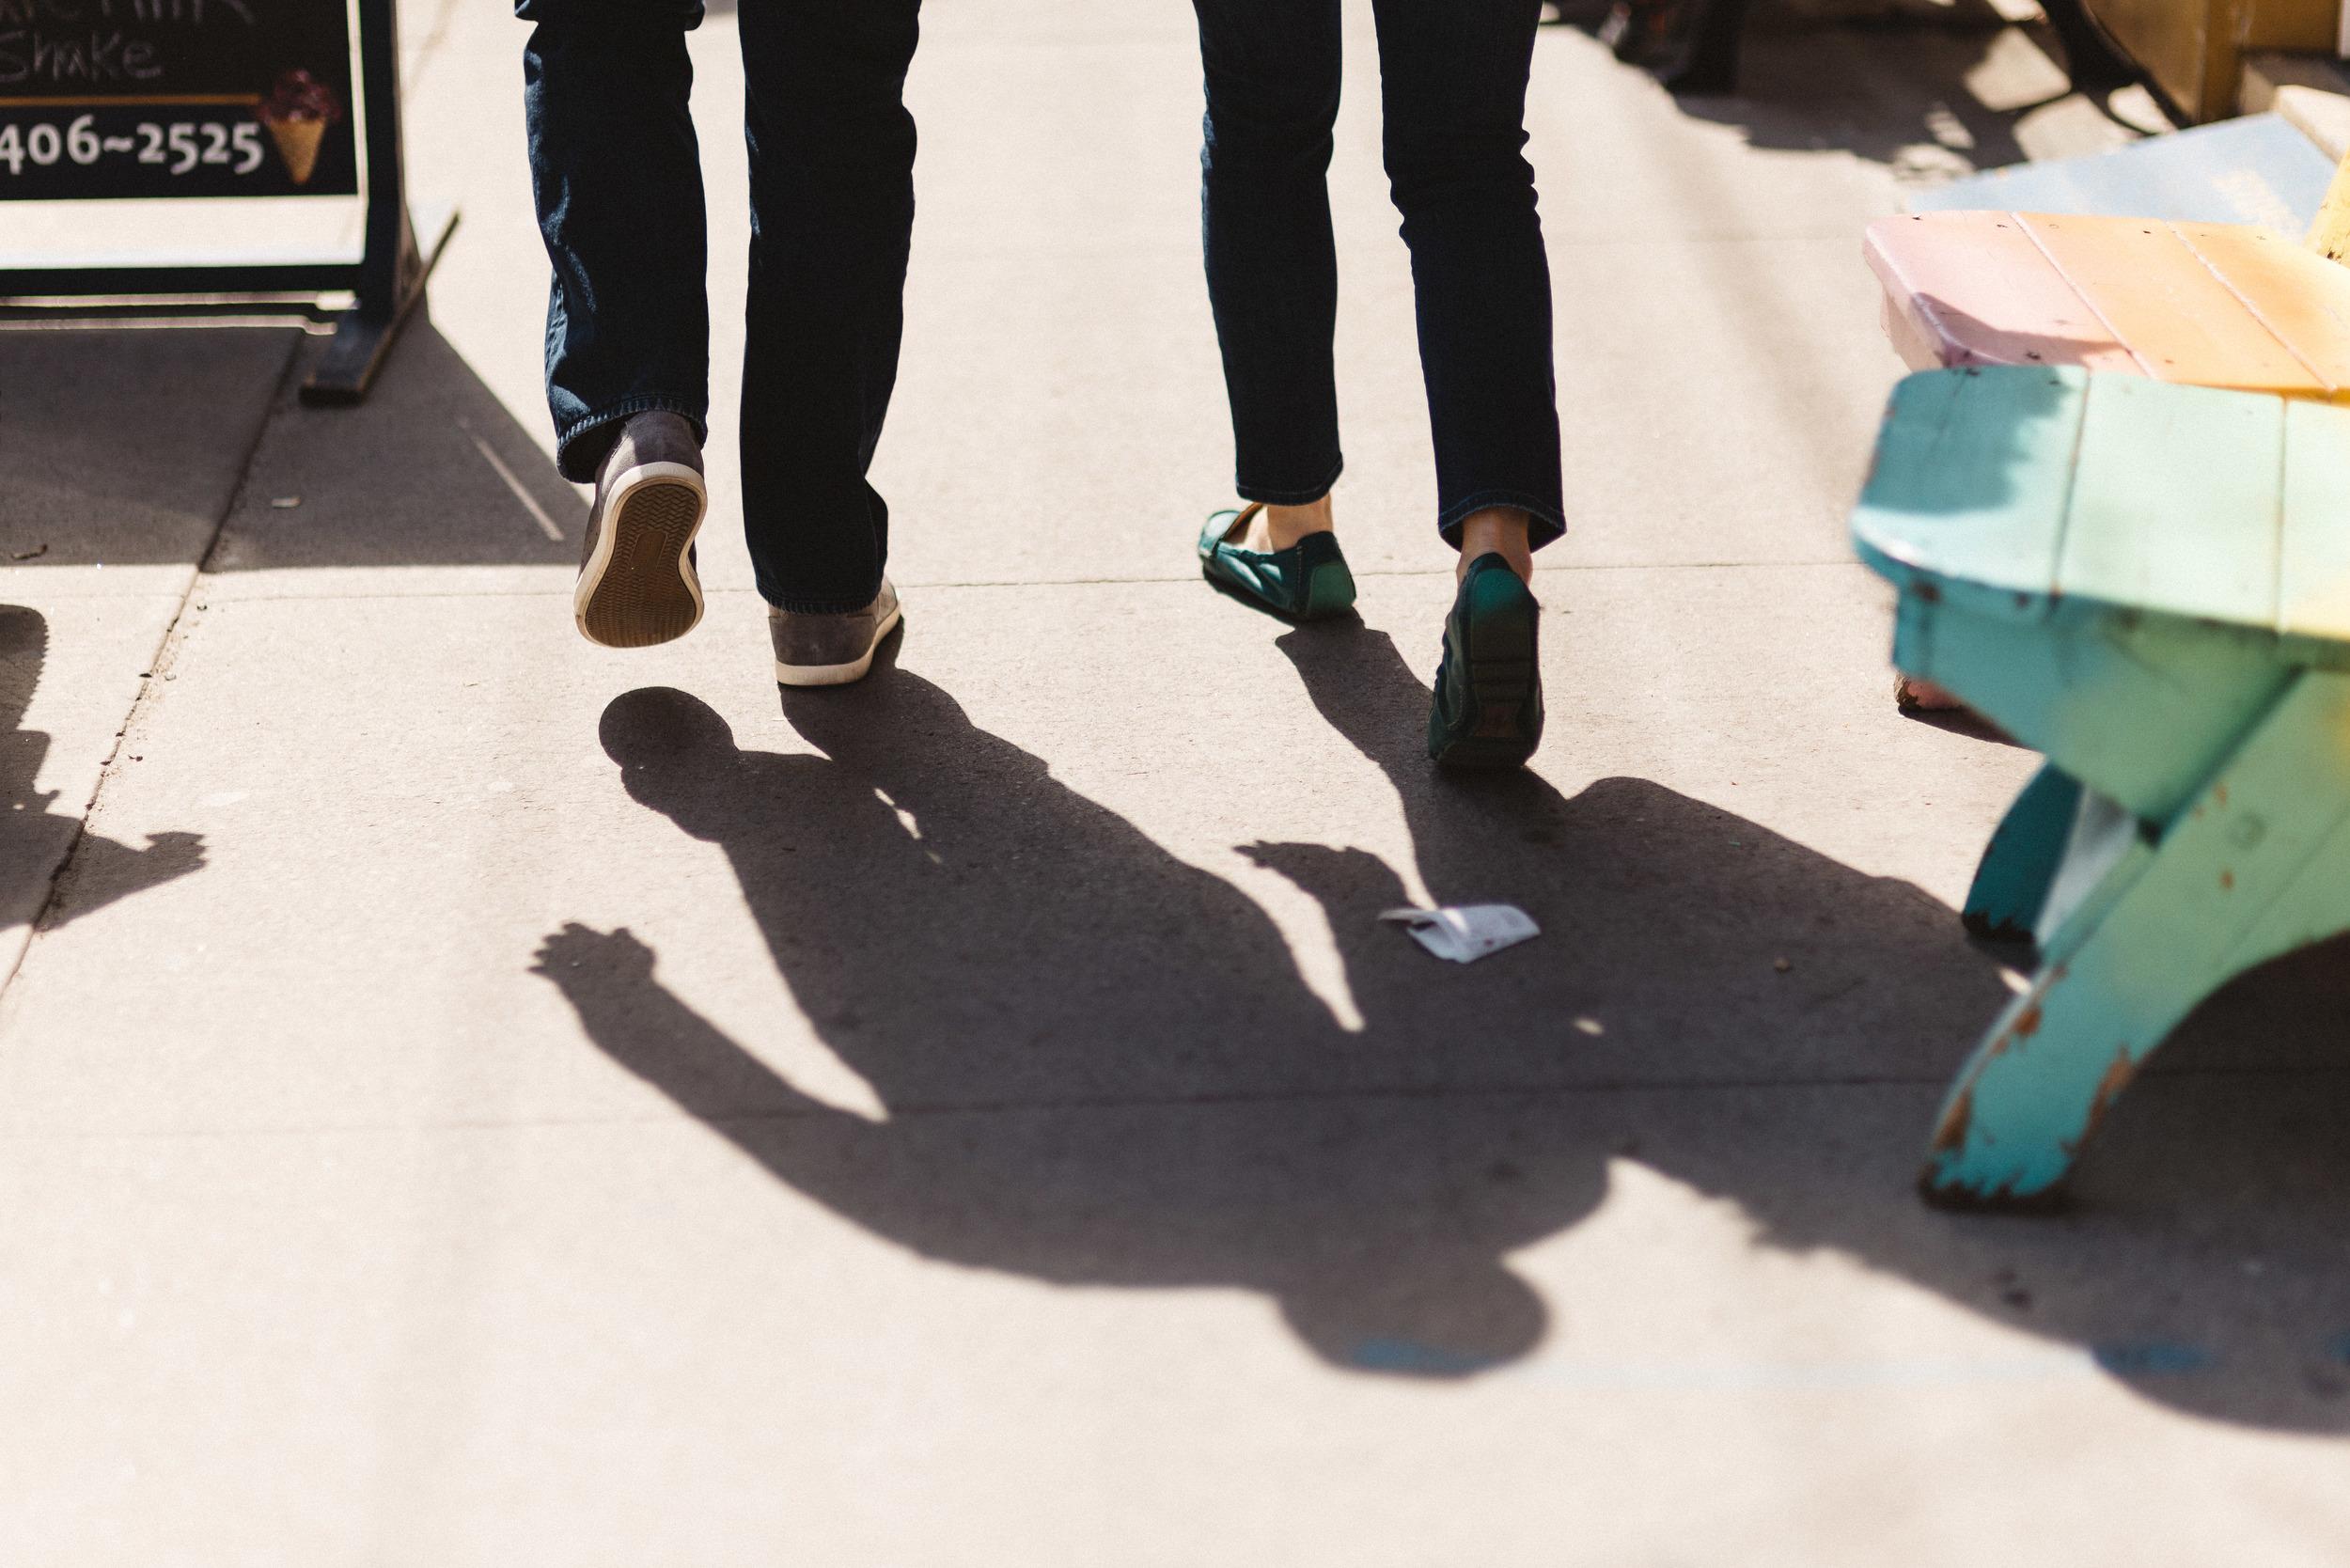 Couple walking down busy Toronto street, GTA